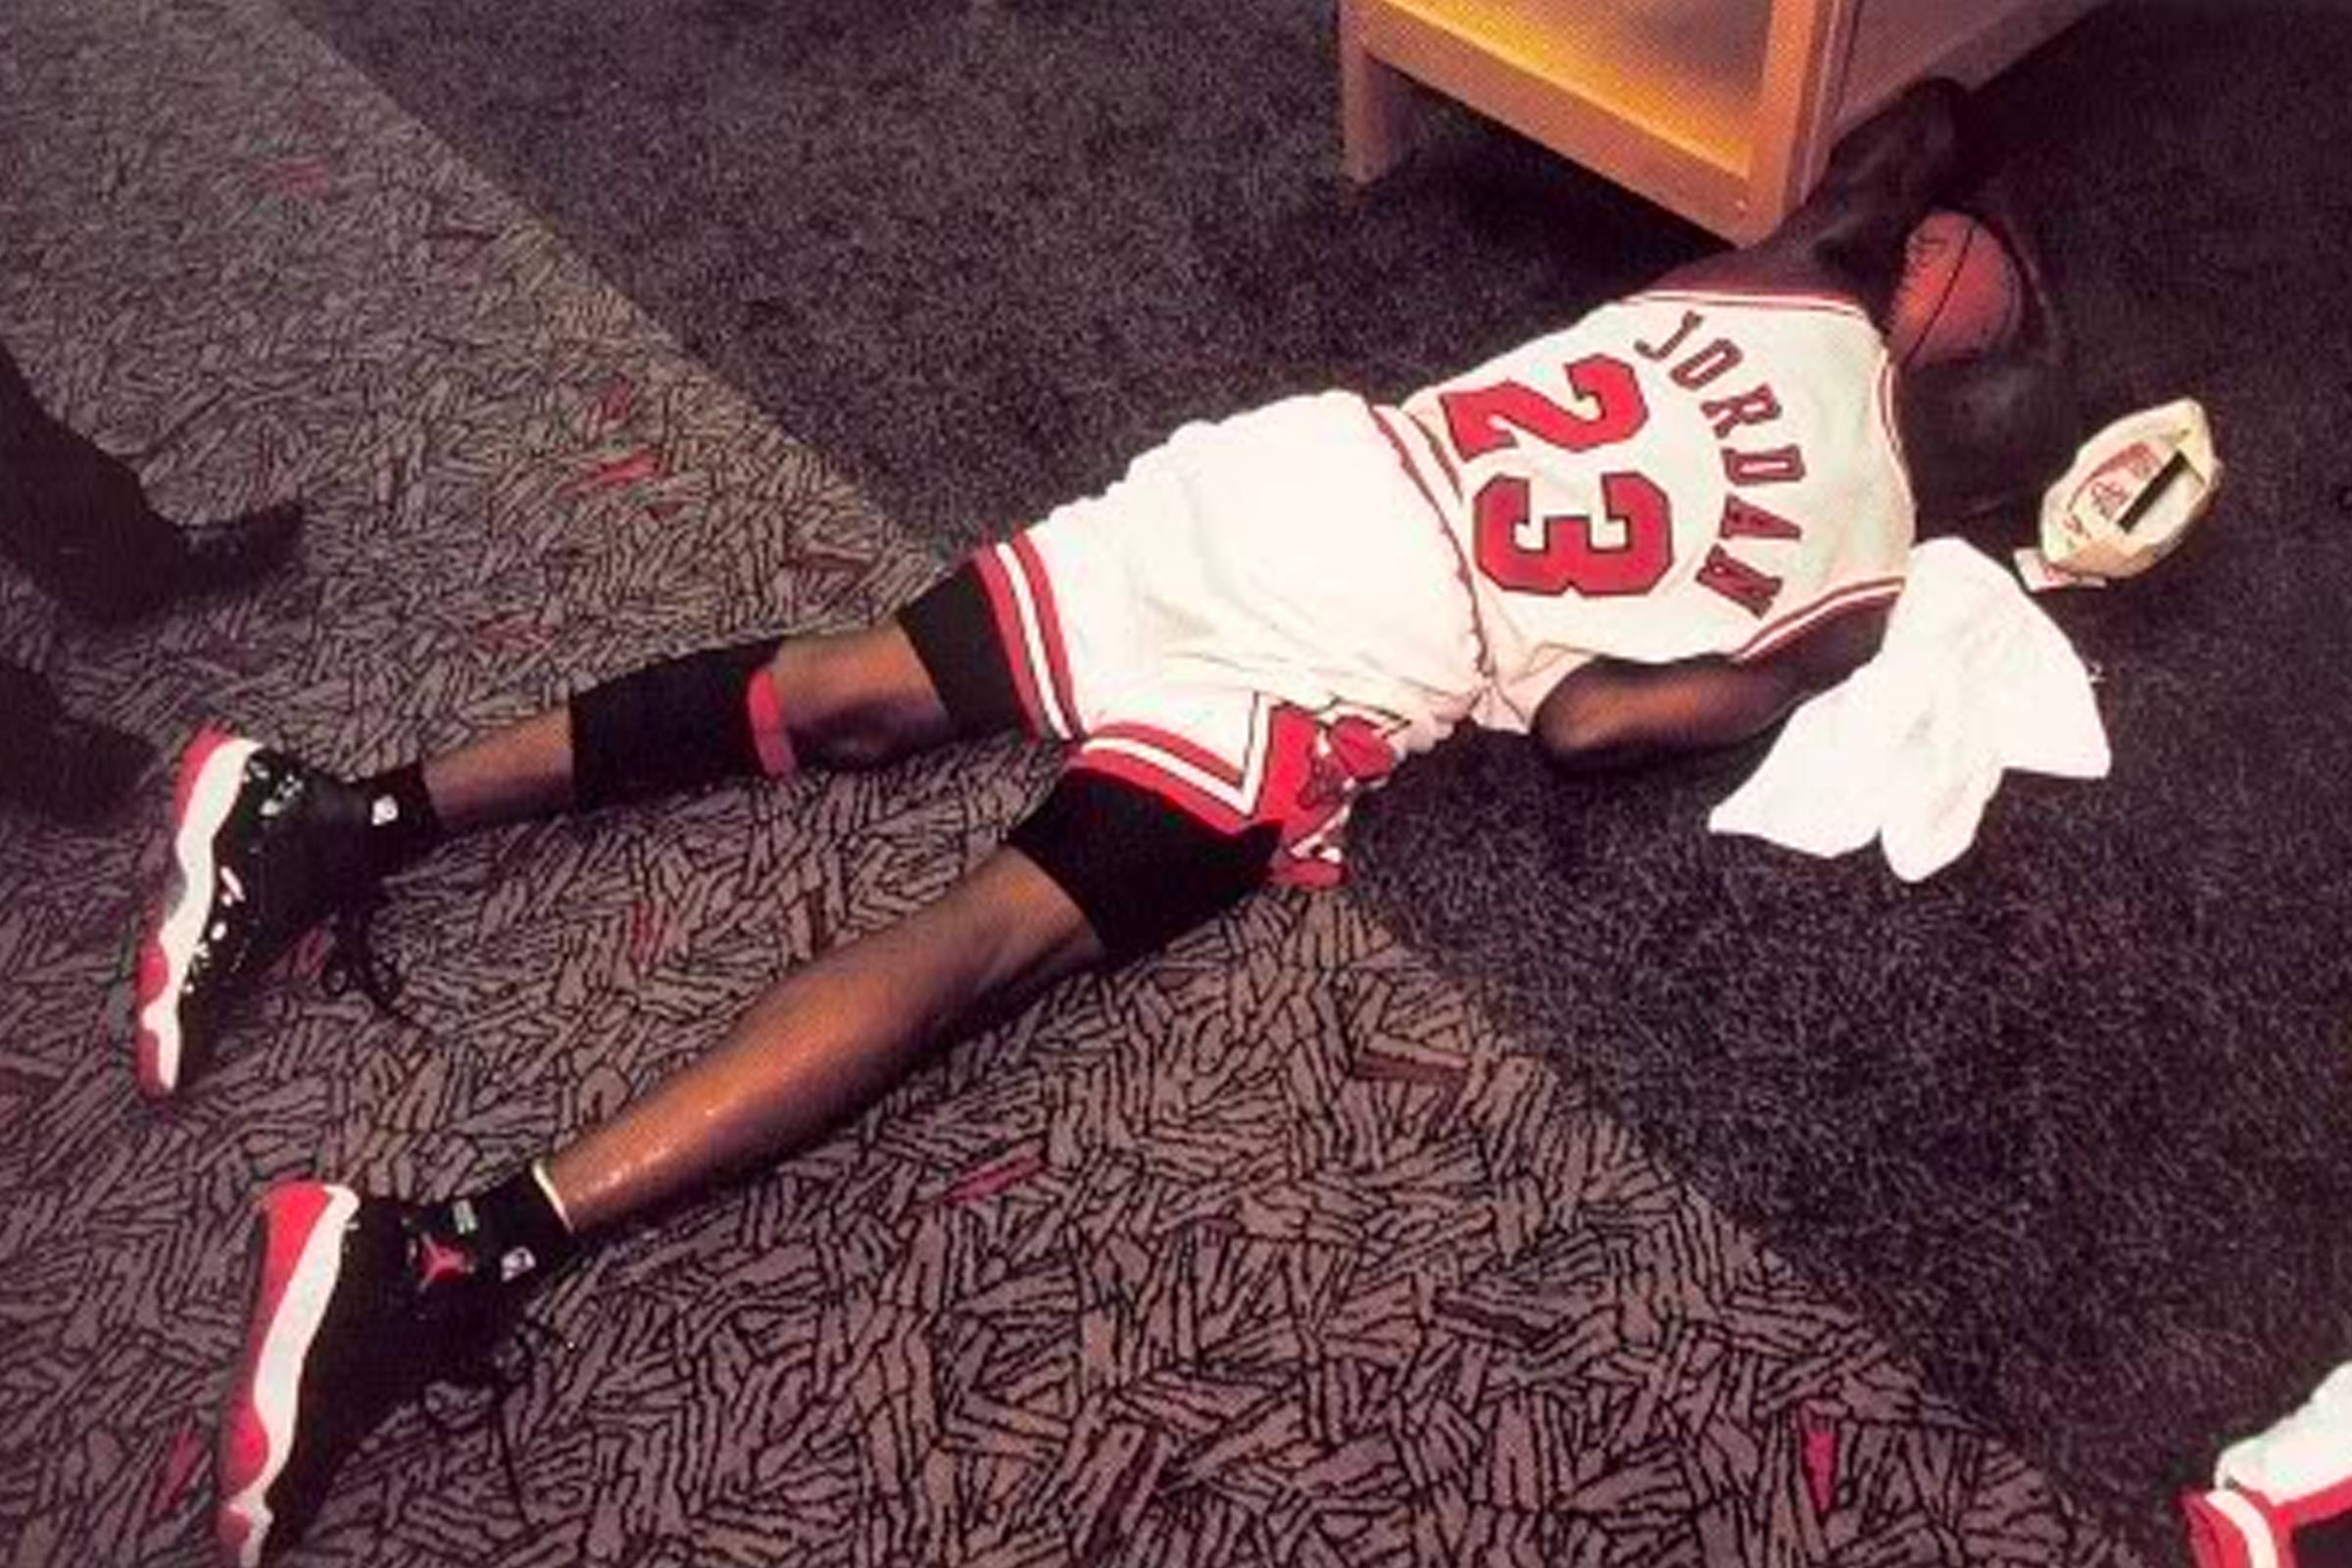 1996 NBA Finals, Game 6